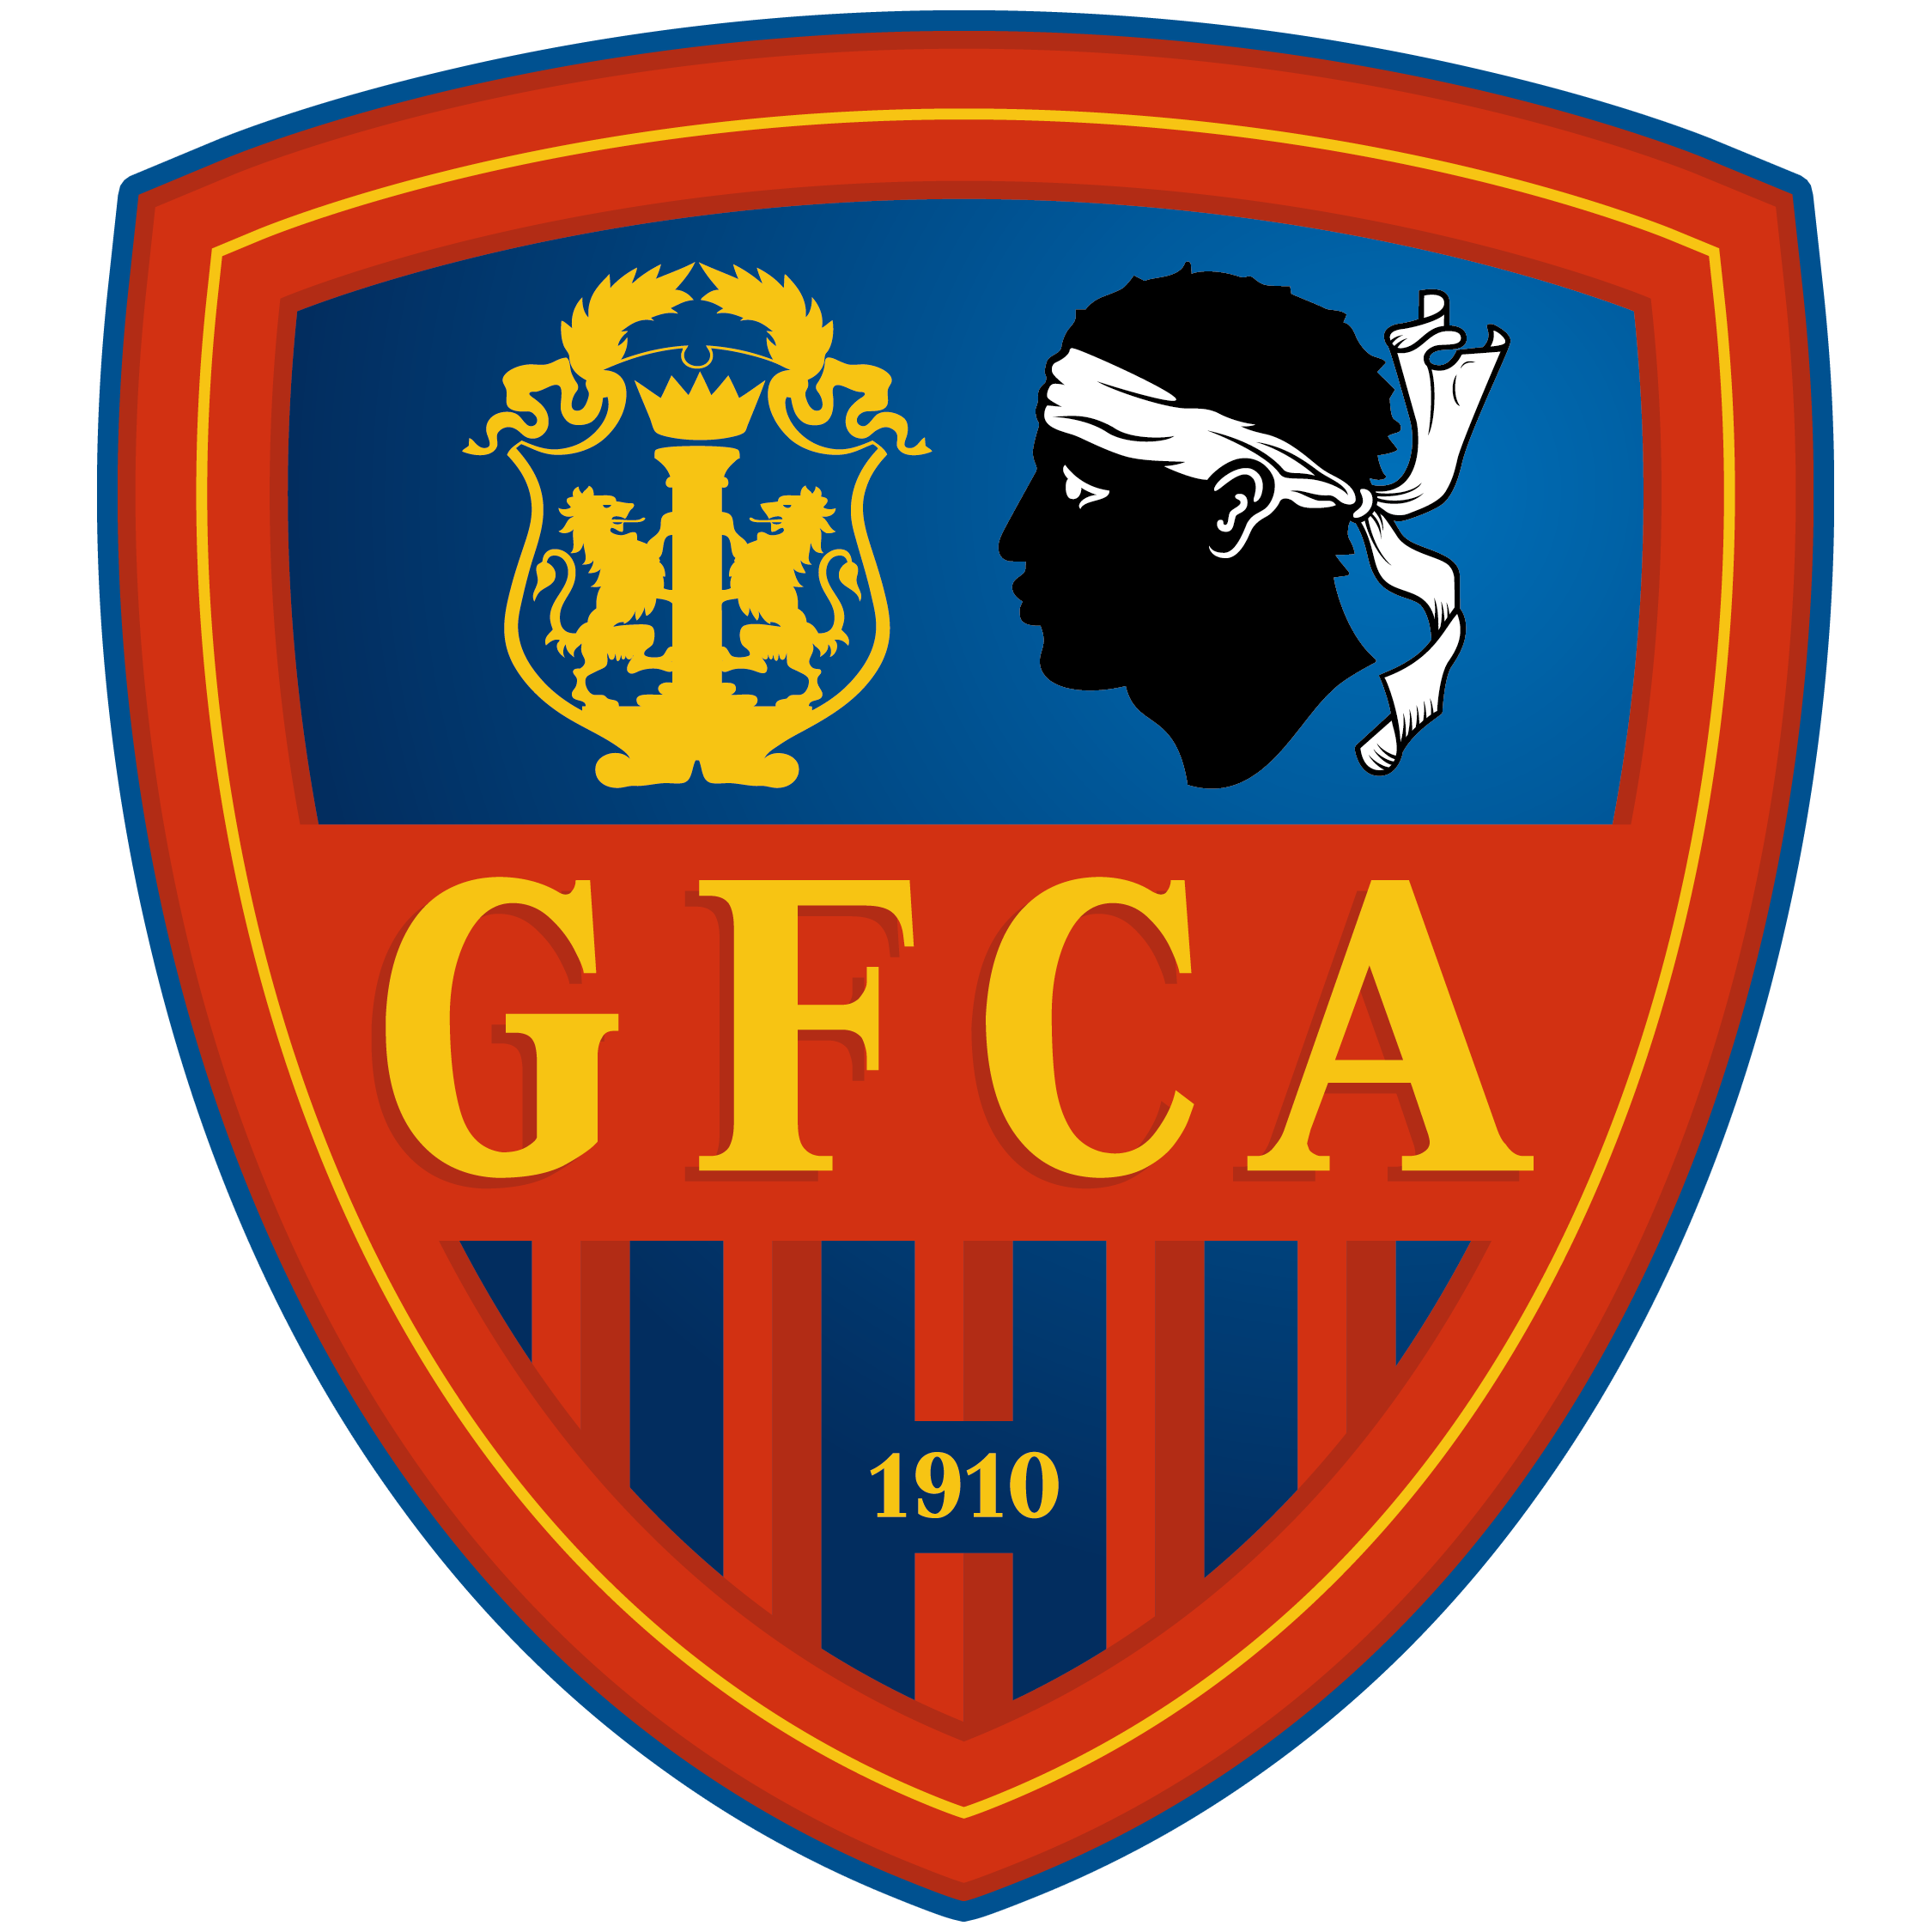 GFCA Football stade et complexe sportif